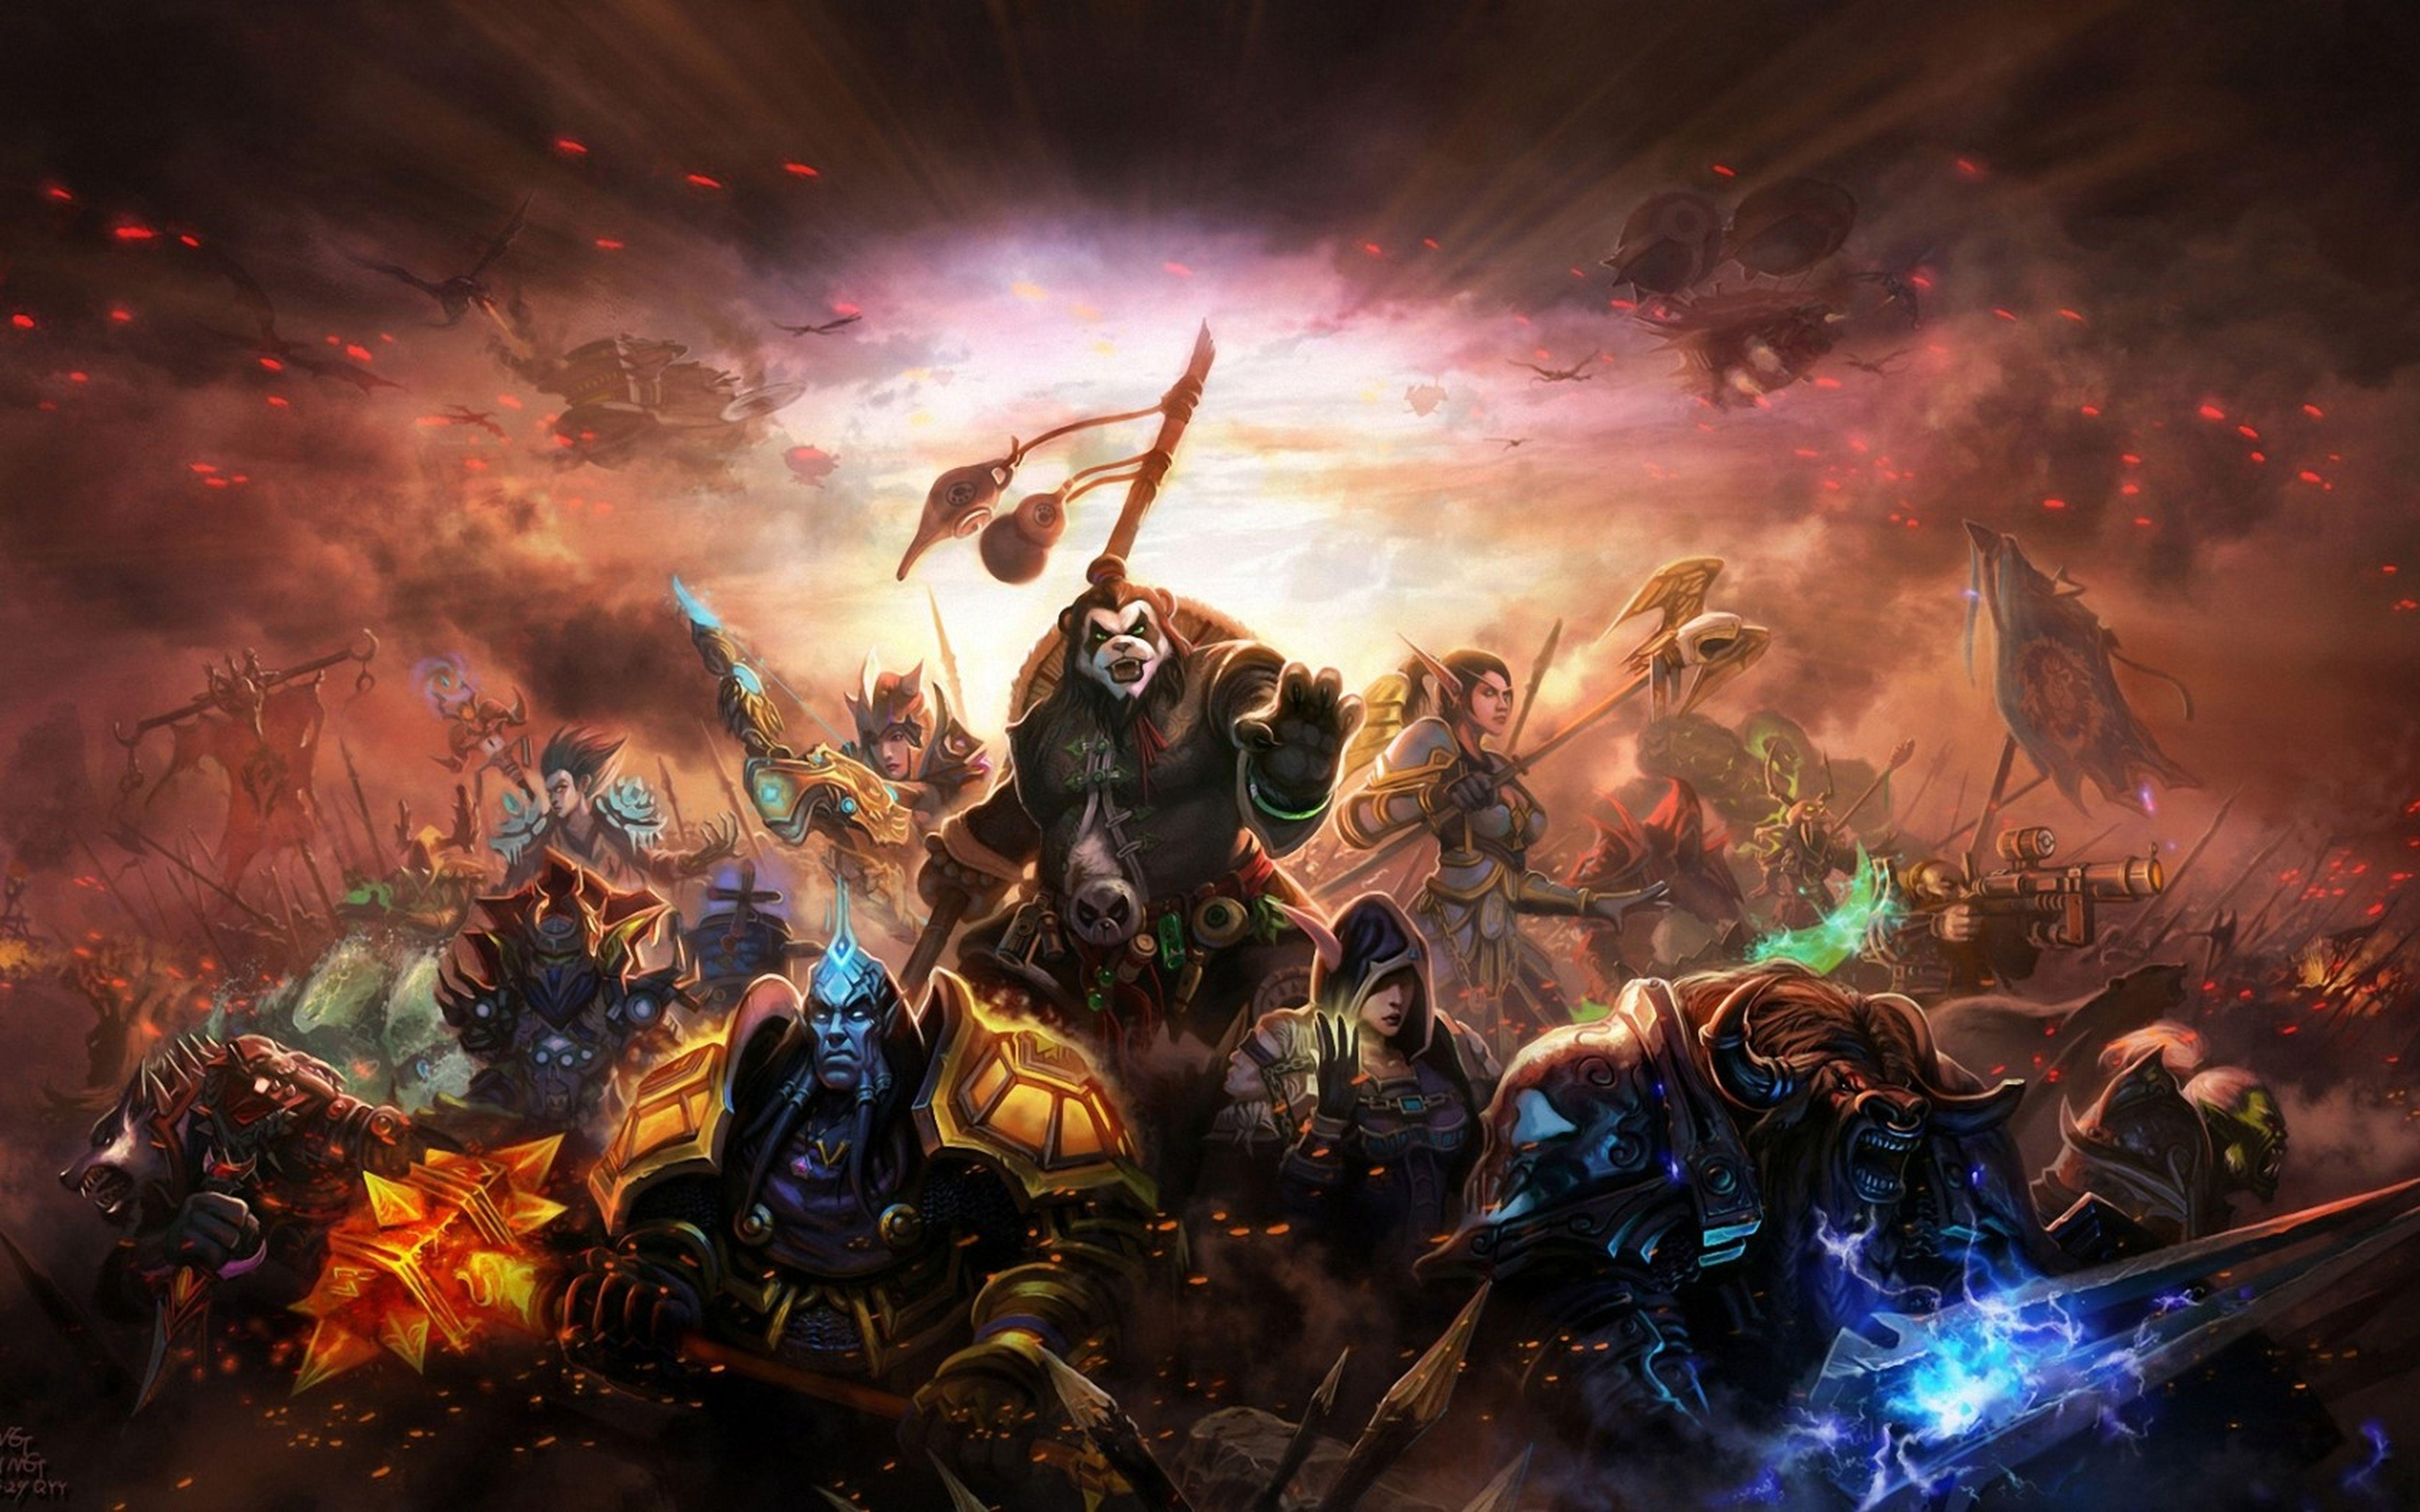 The Legend Of Zelda Hd Wallpaper World Of Warcraft Wallpapers High Quality Pixelstalk Net